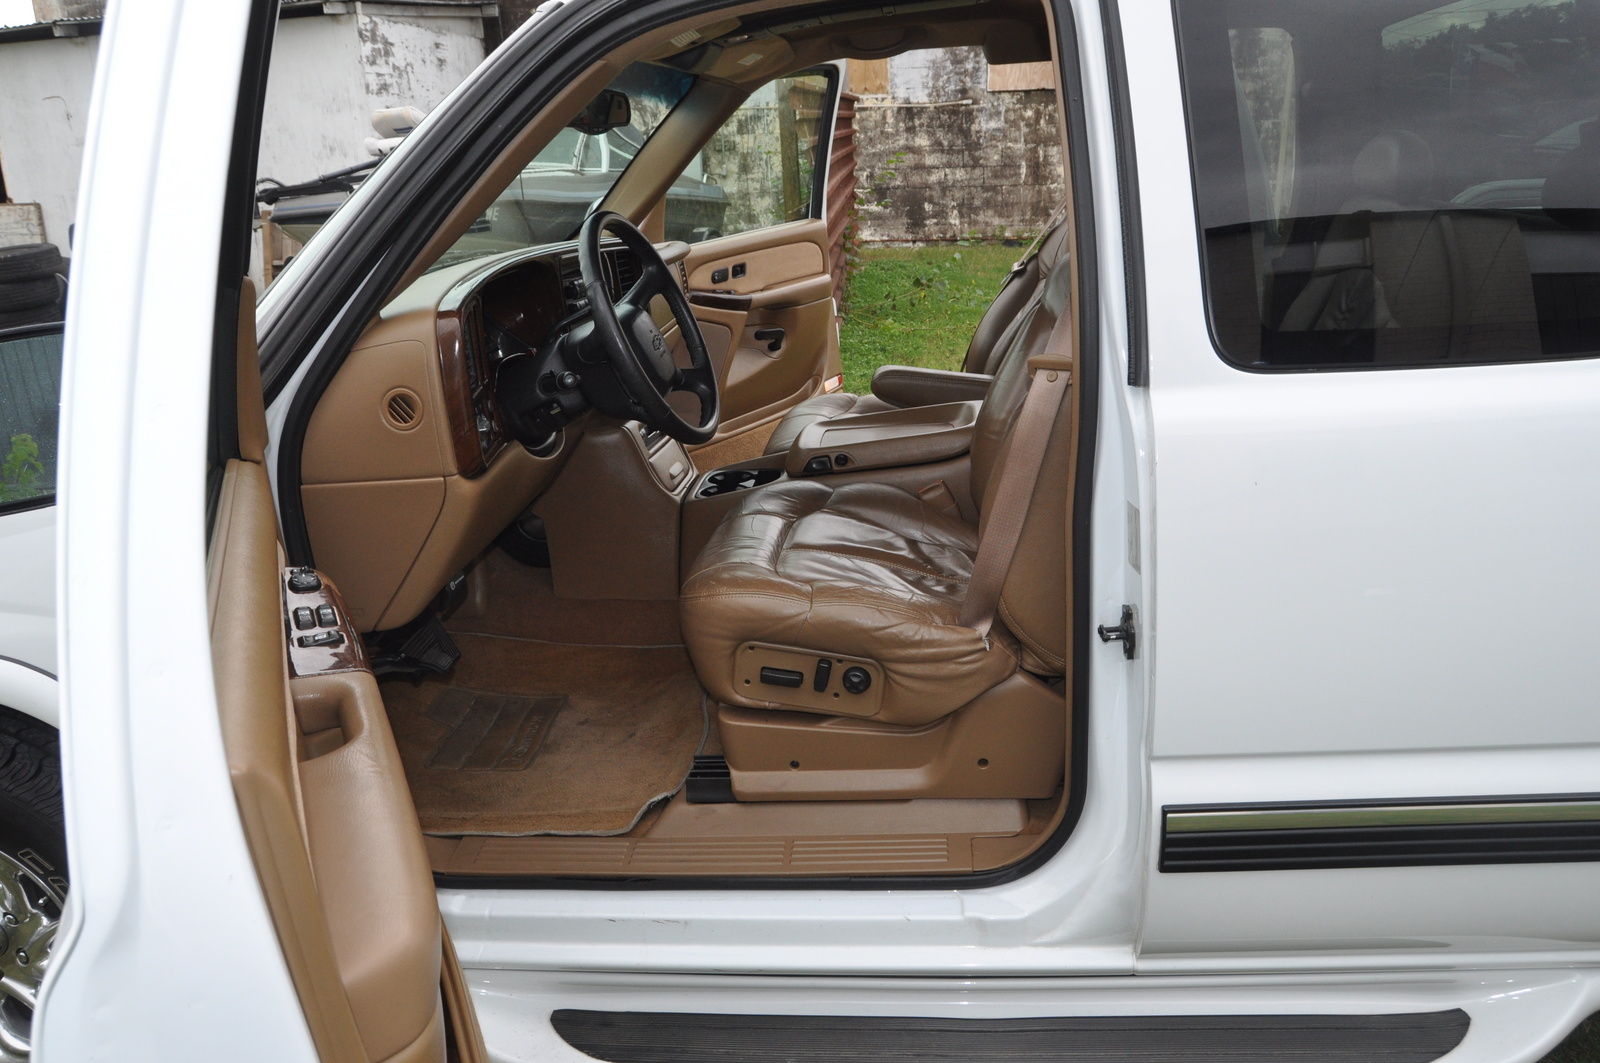 Picture Of 2000 Chevrolet Silverado 1500 Lt Ext Cab Short Bed 2wd Interior